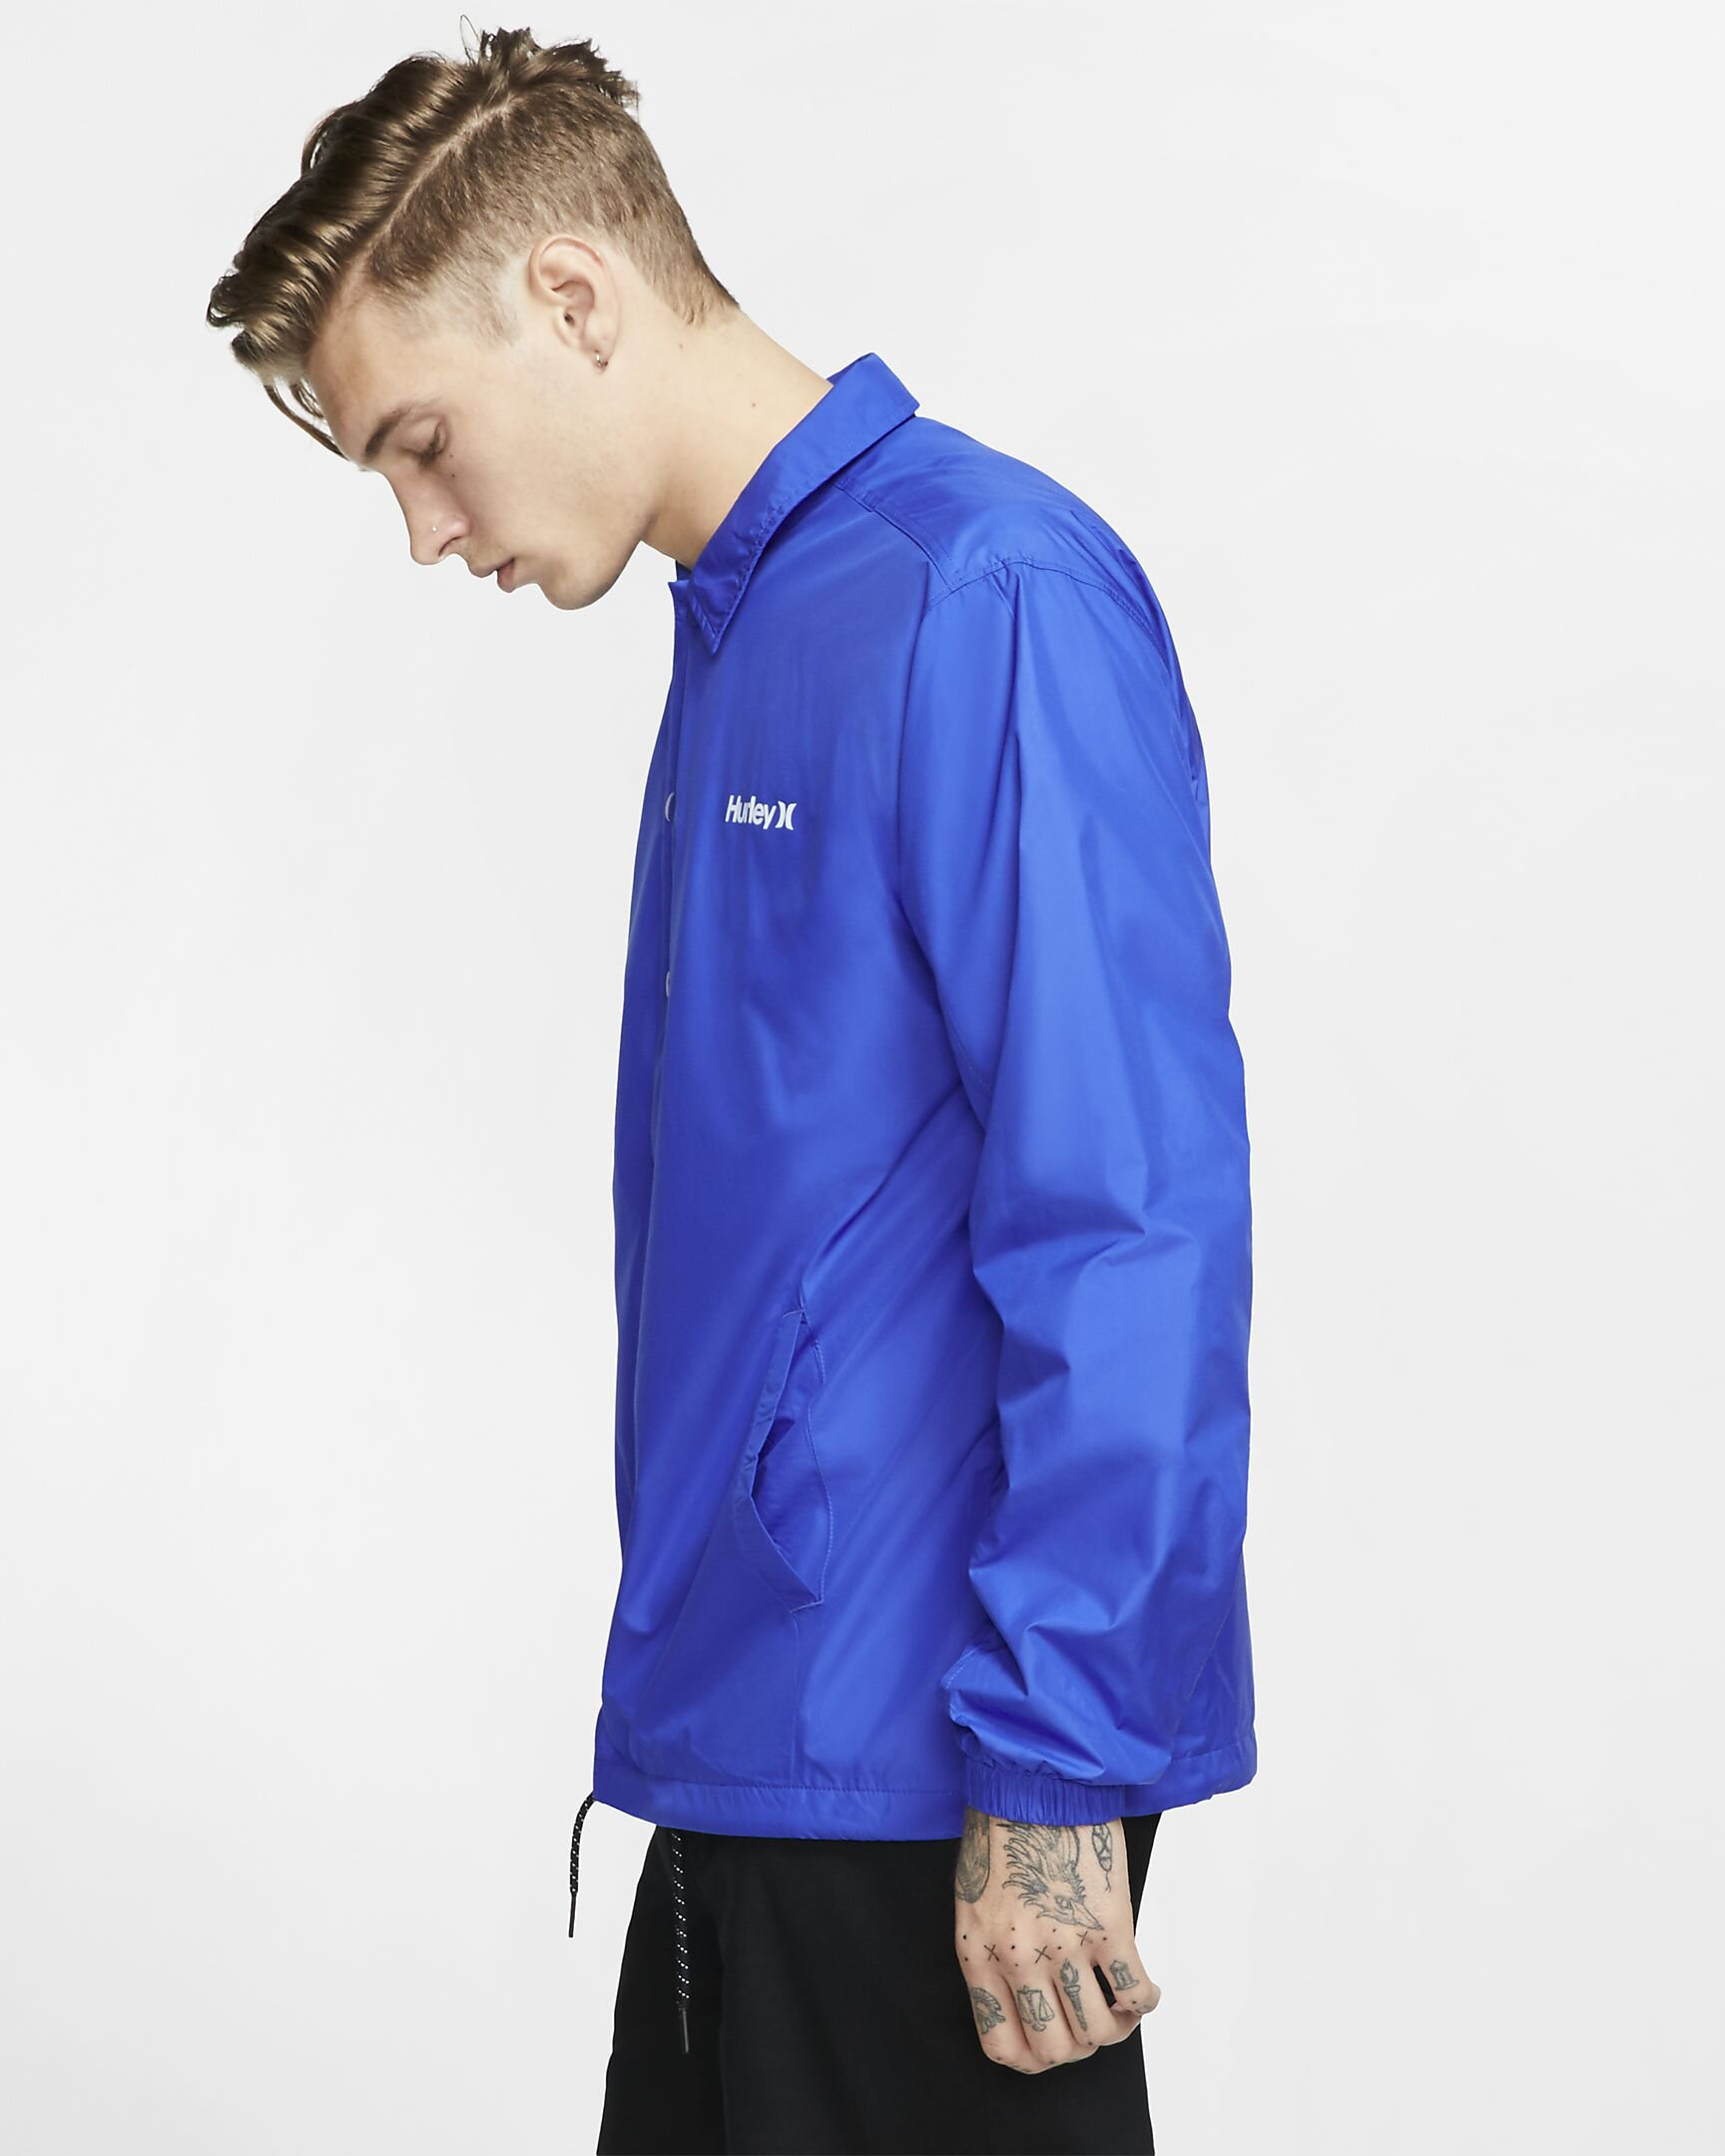 hurley-siege-coaches-mens-jacket-tp89wj-1.jpg